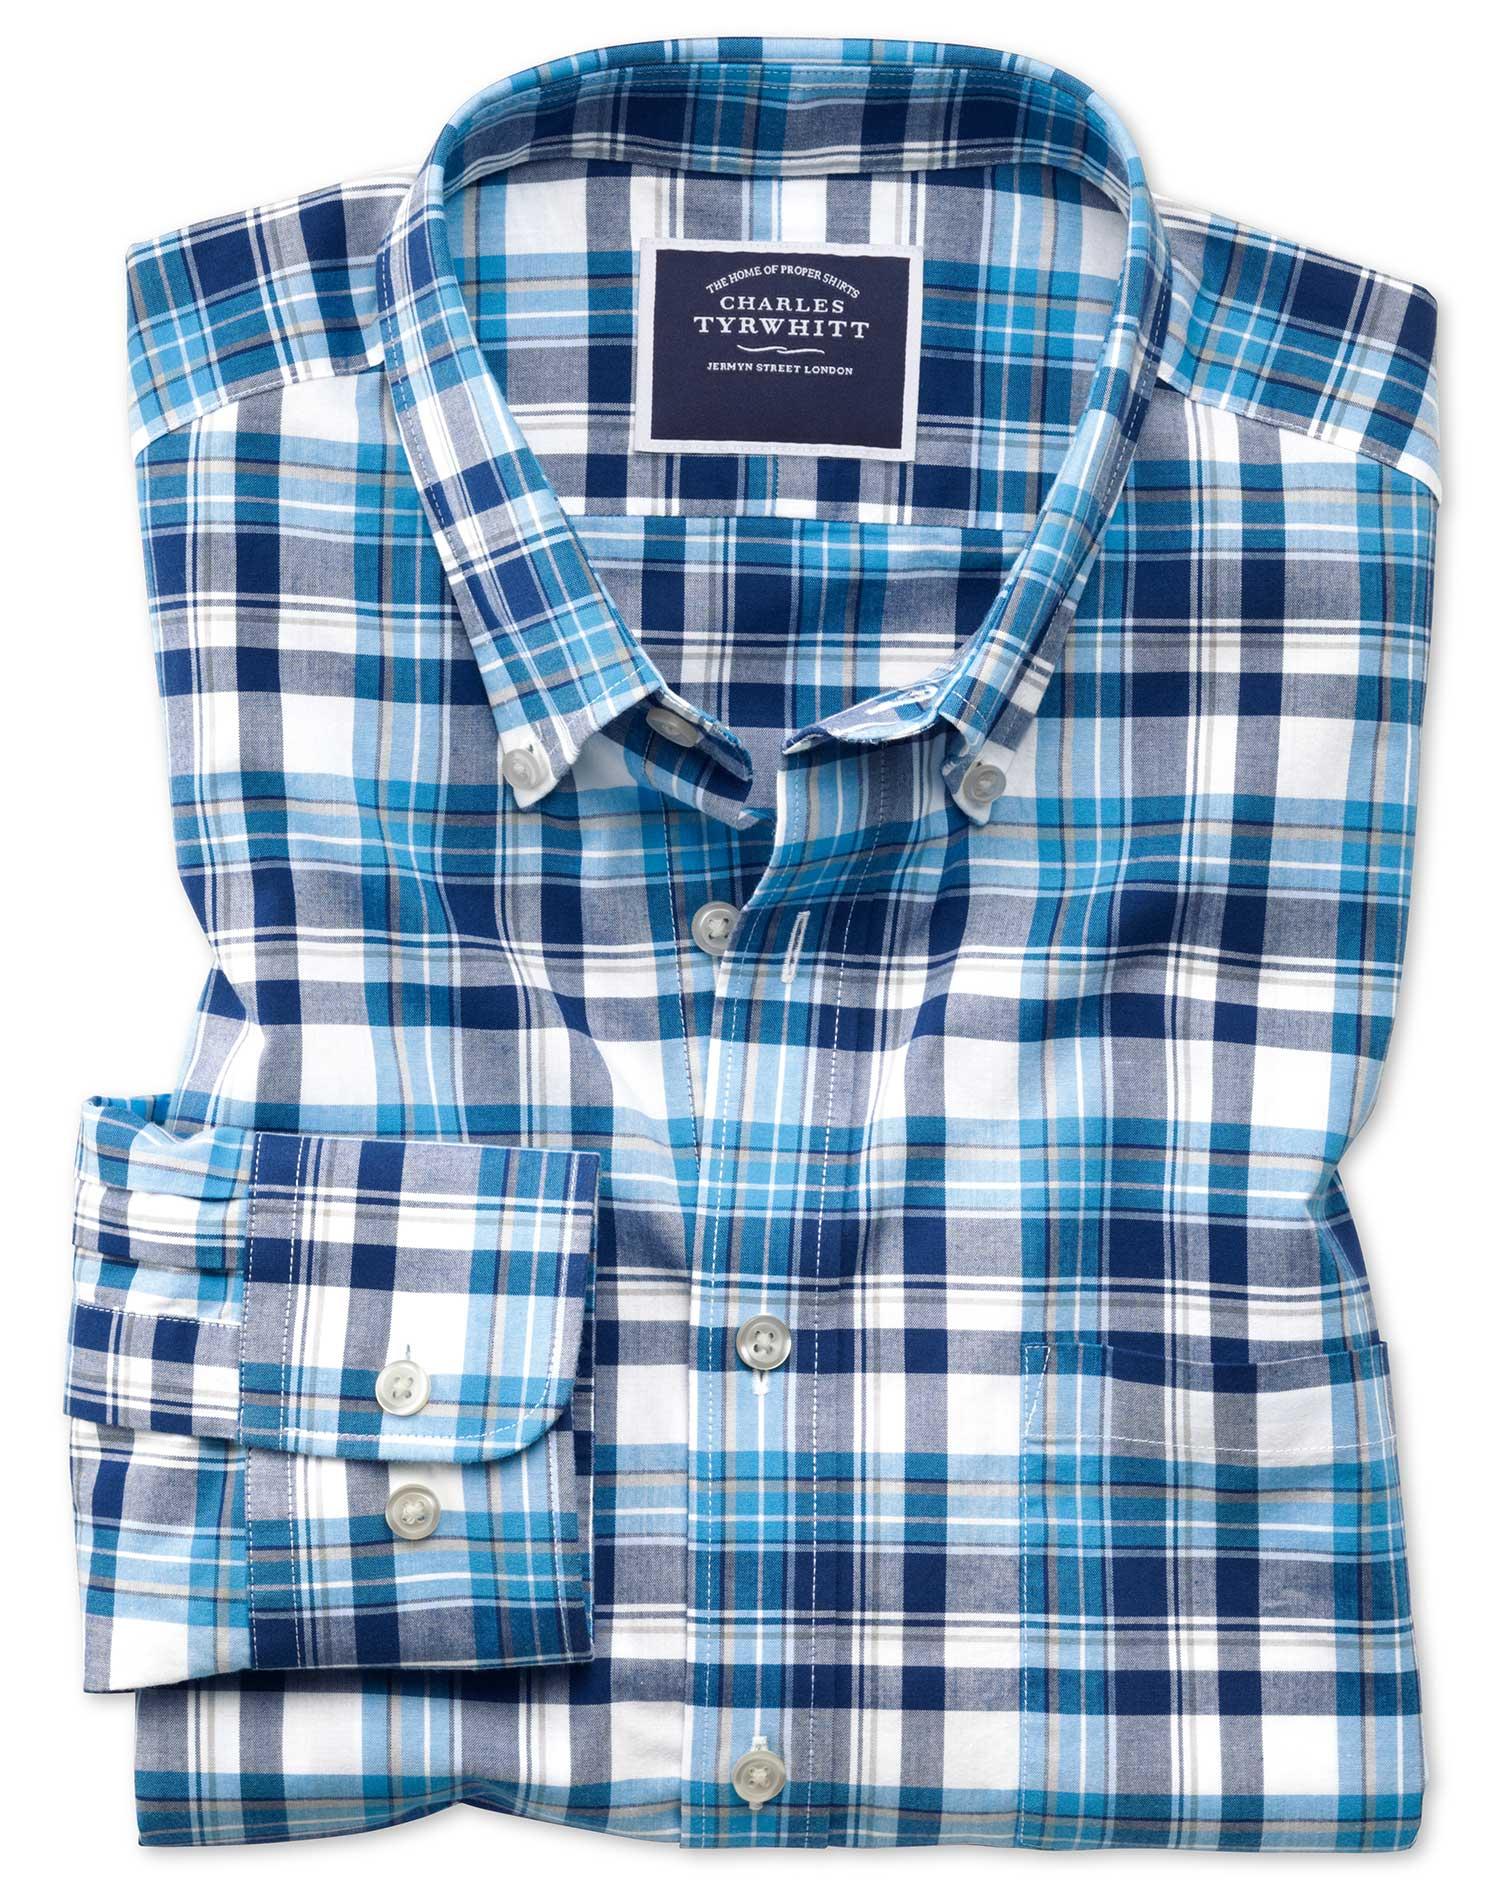 Slim Fit Poplin Navy Multi Cotton Shirt Single Cuff Size Medium by Charles Tyrwhitt